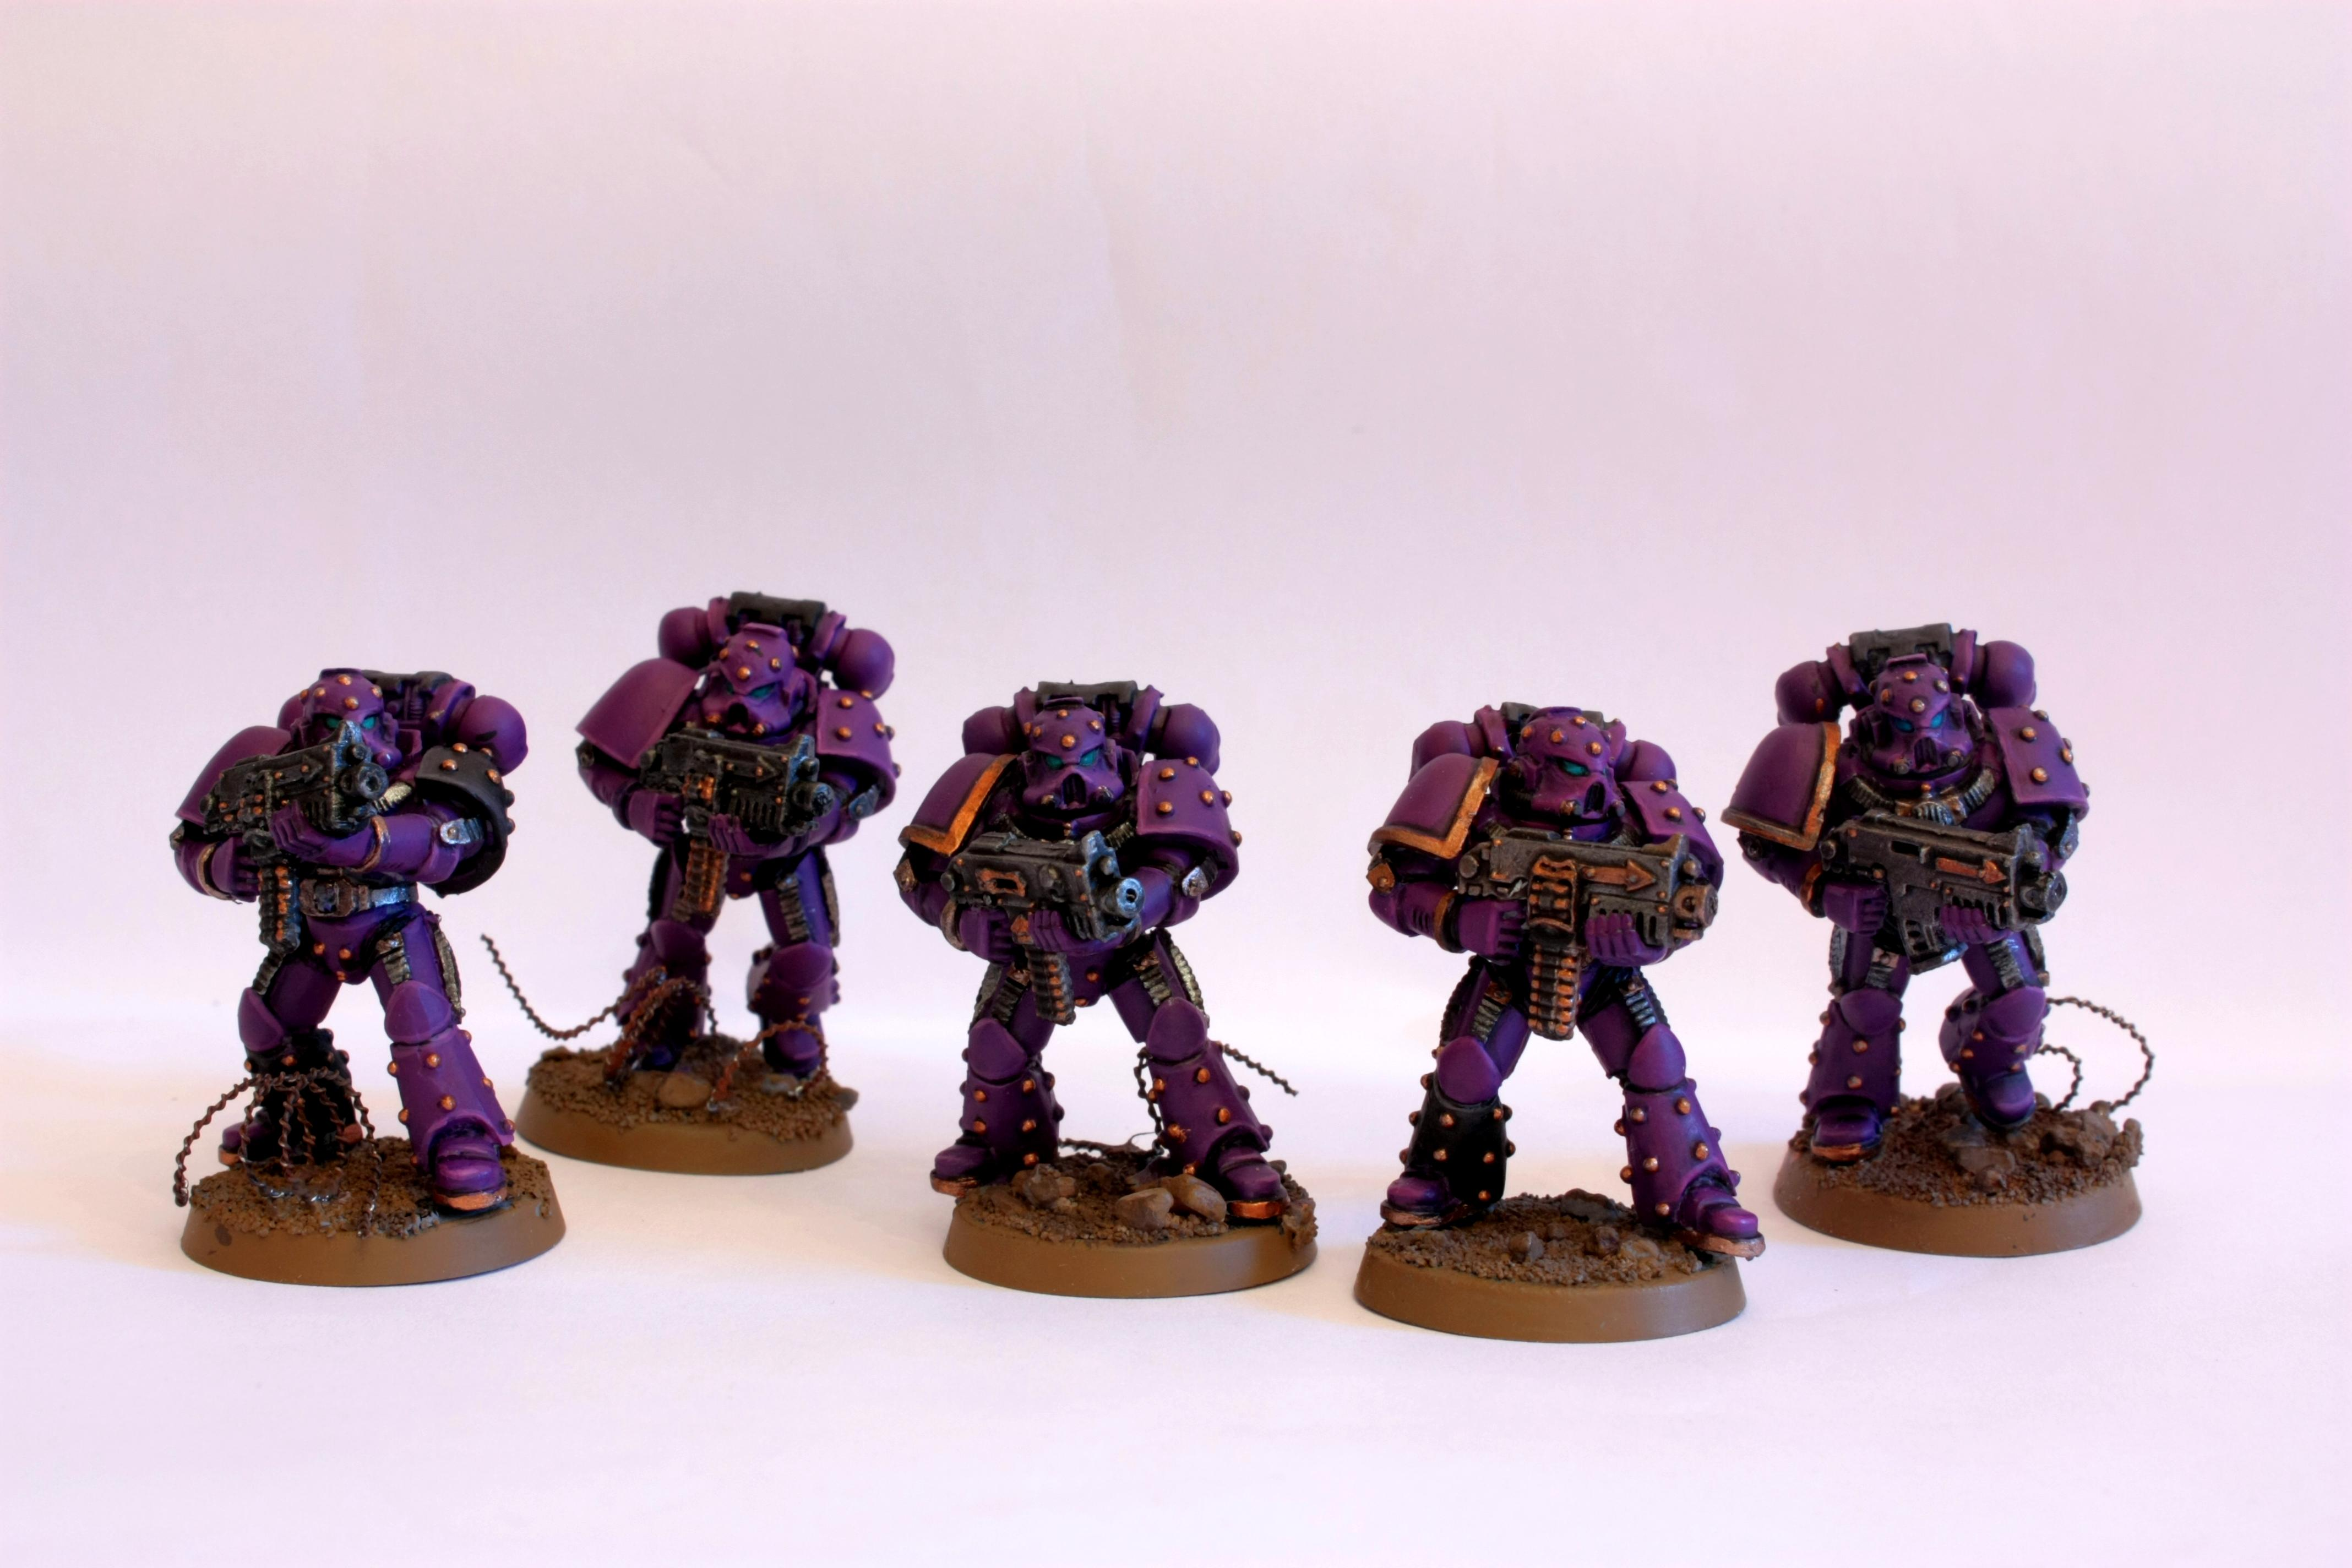 Chaos Space Marines, Ec, Emperor's Children, Forge World, Heresy Era, Purple, Slaanesh, Space Marines